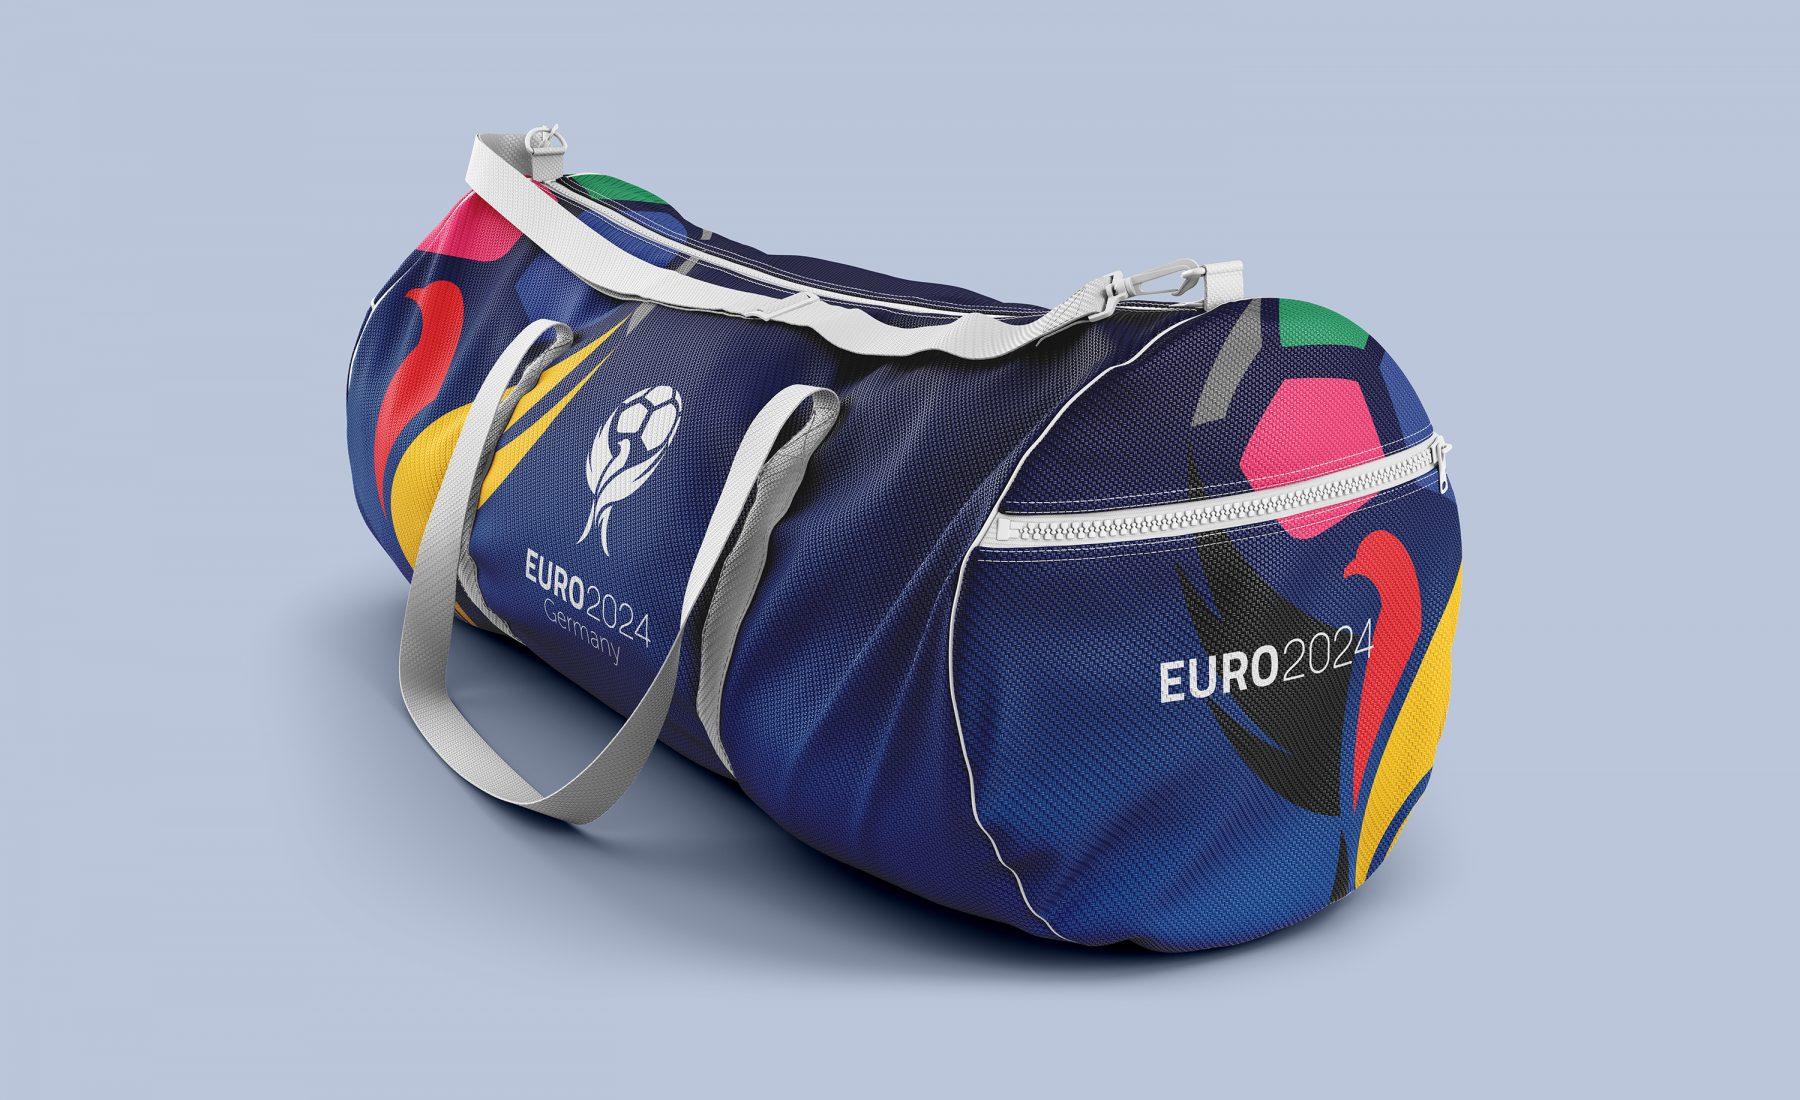 17th edition of the UEFA European Championship, Germany June – July 2024,Jovoto, football, reputation, logo, branding